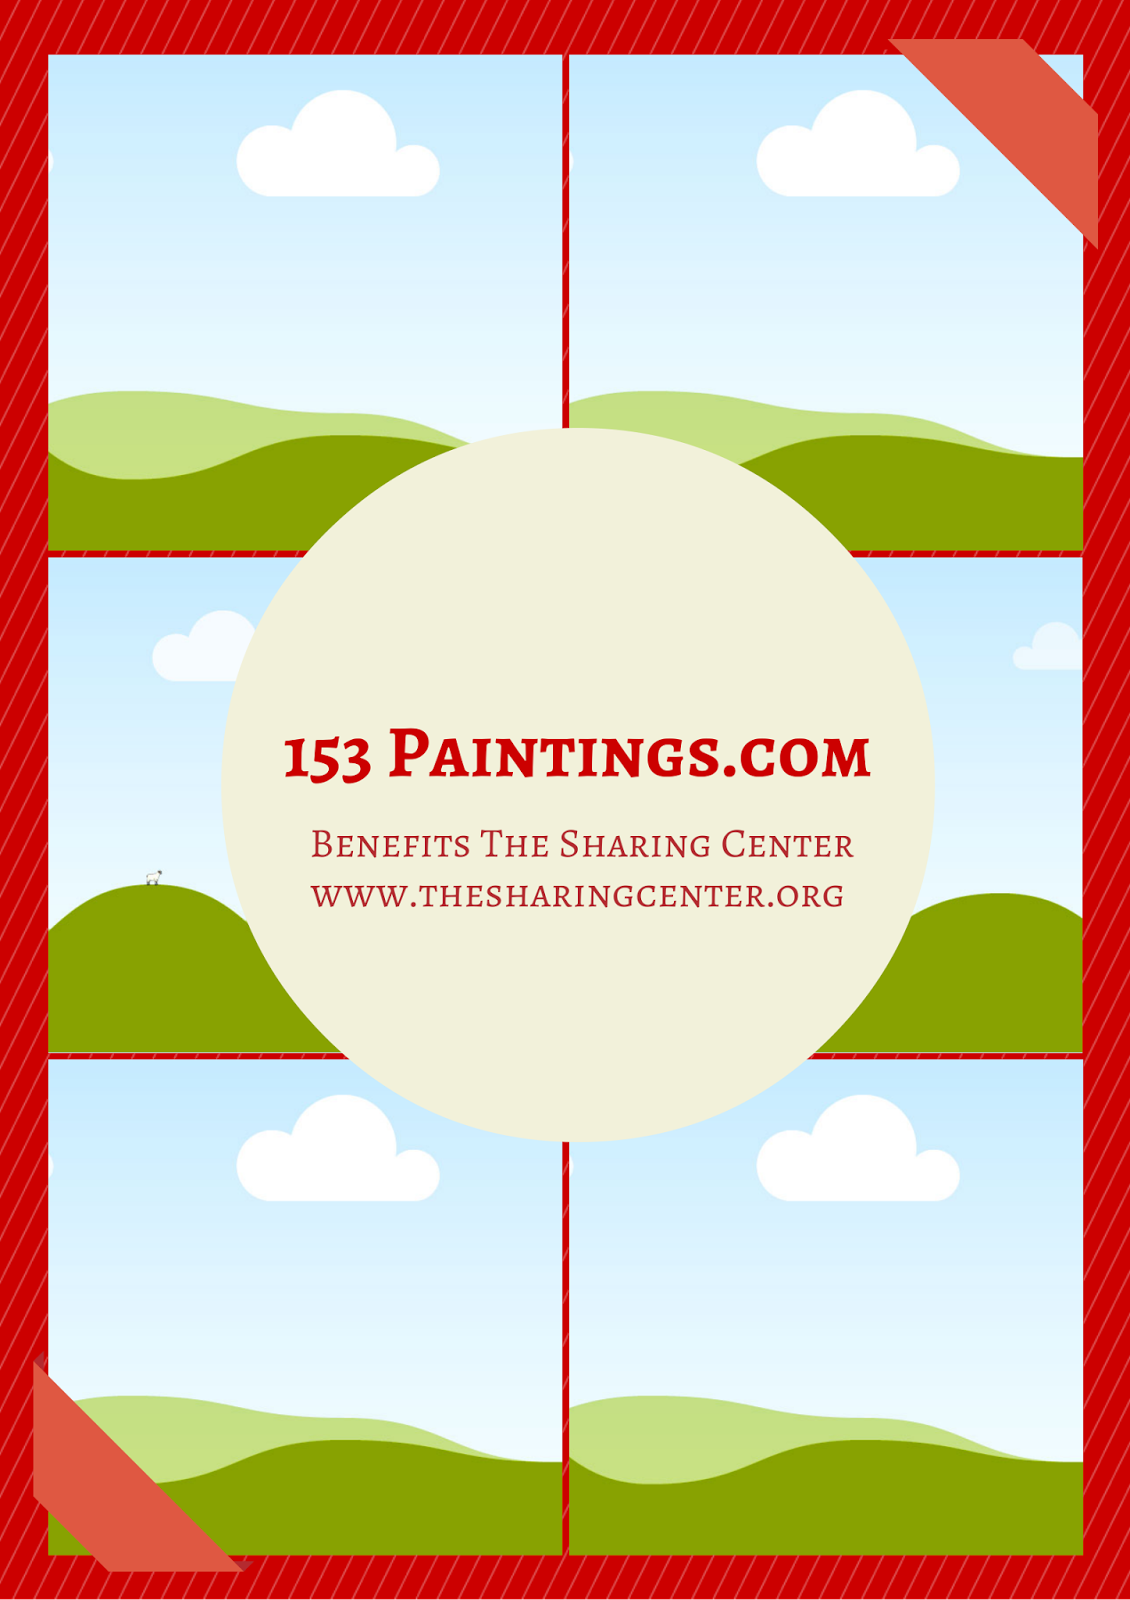 153Paintings.com